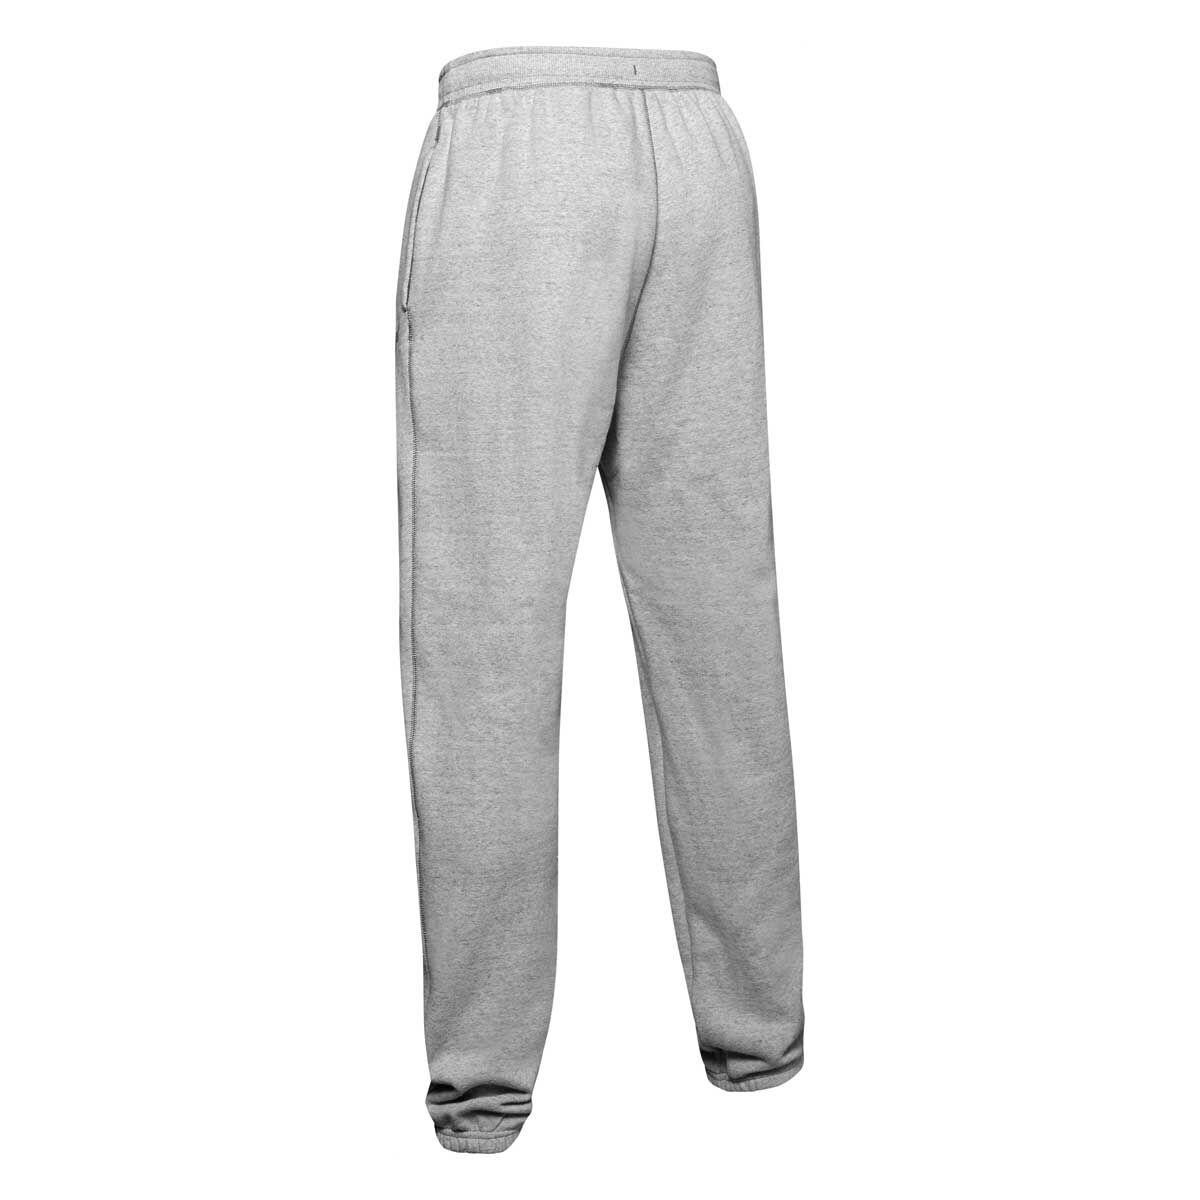 Mens Track Pants Clothing rebel